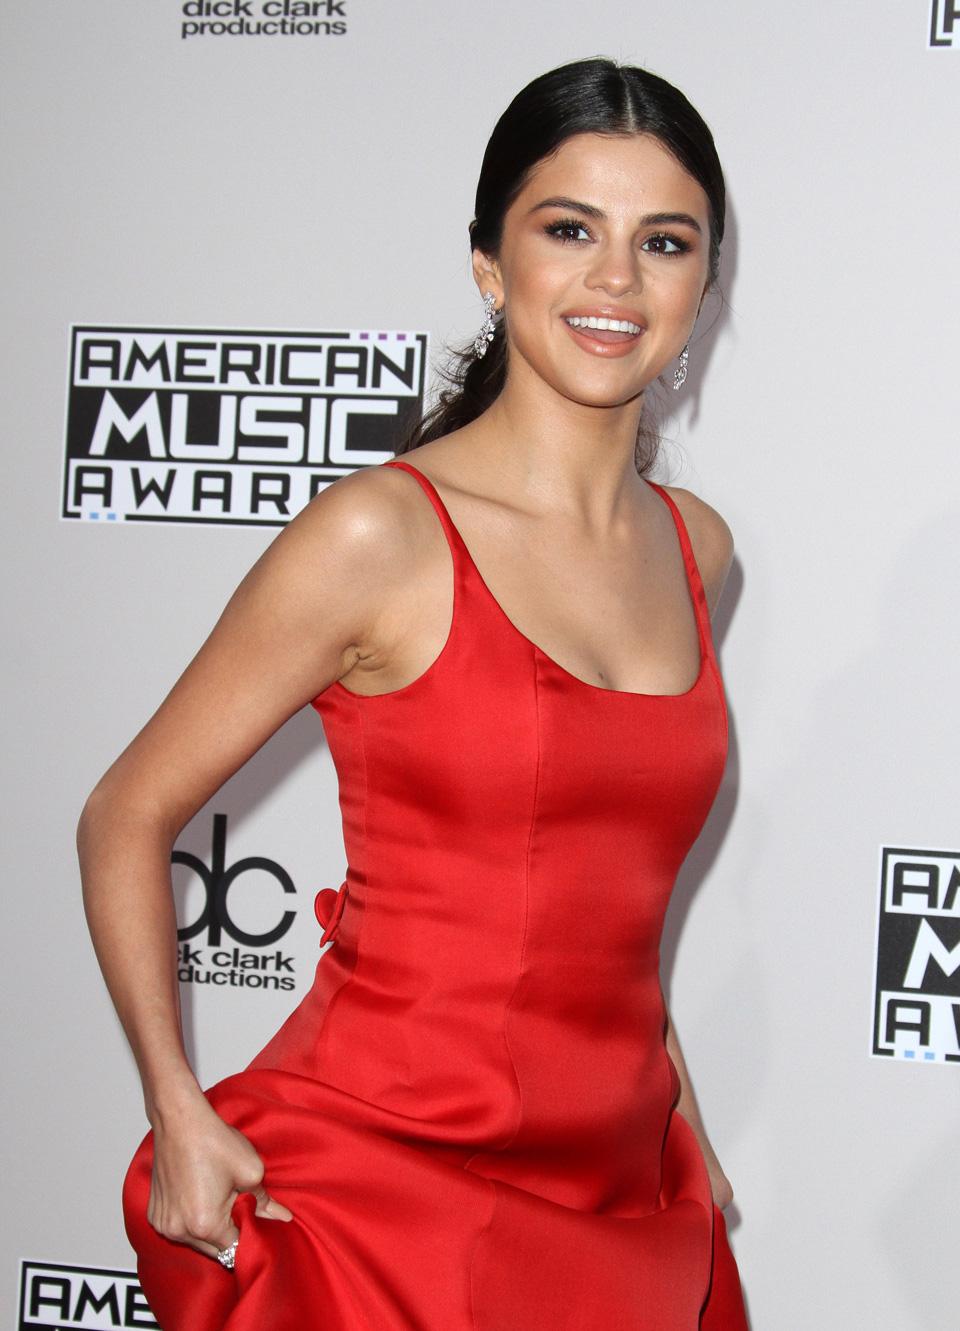 Selina Gomez in red dress smiling